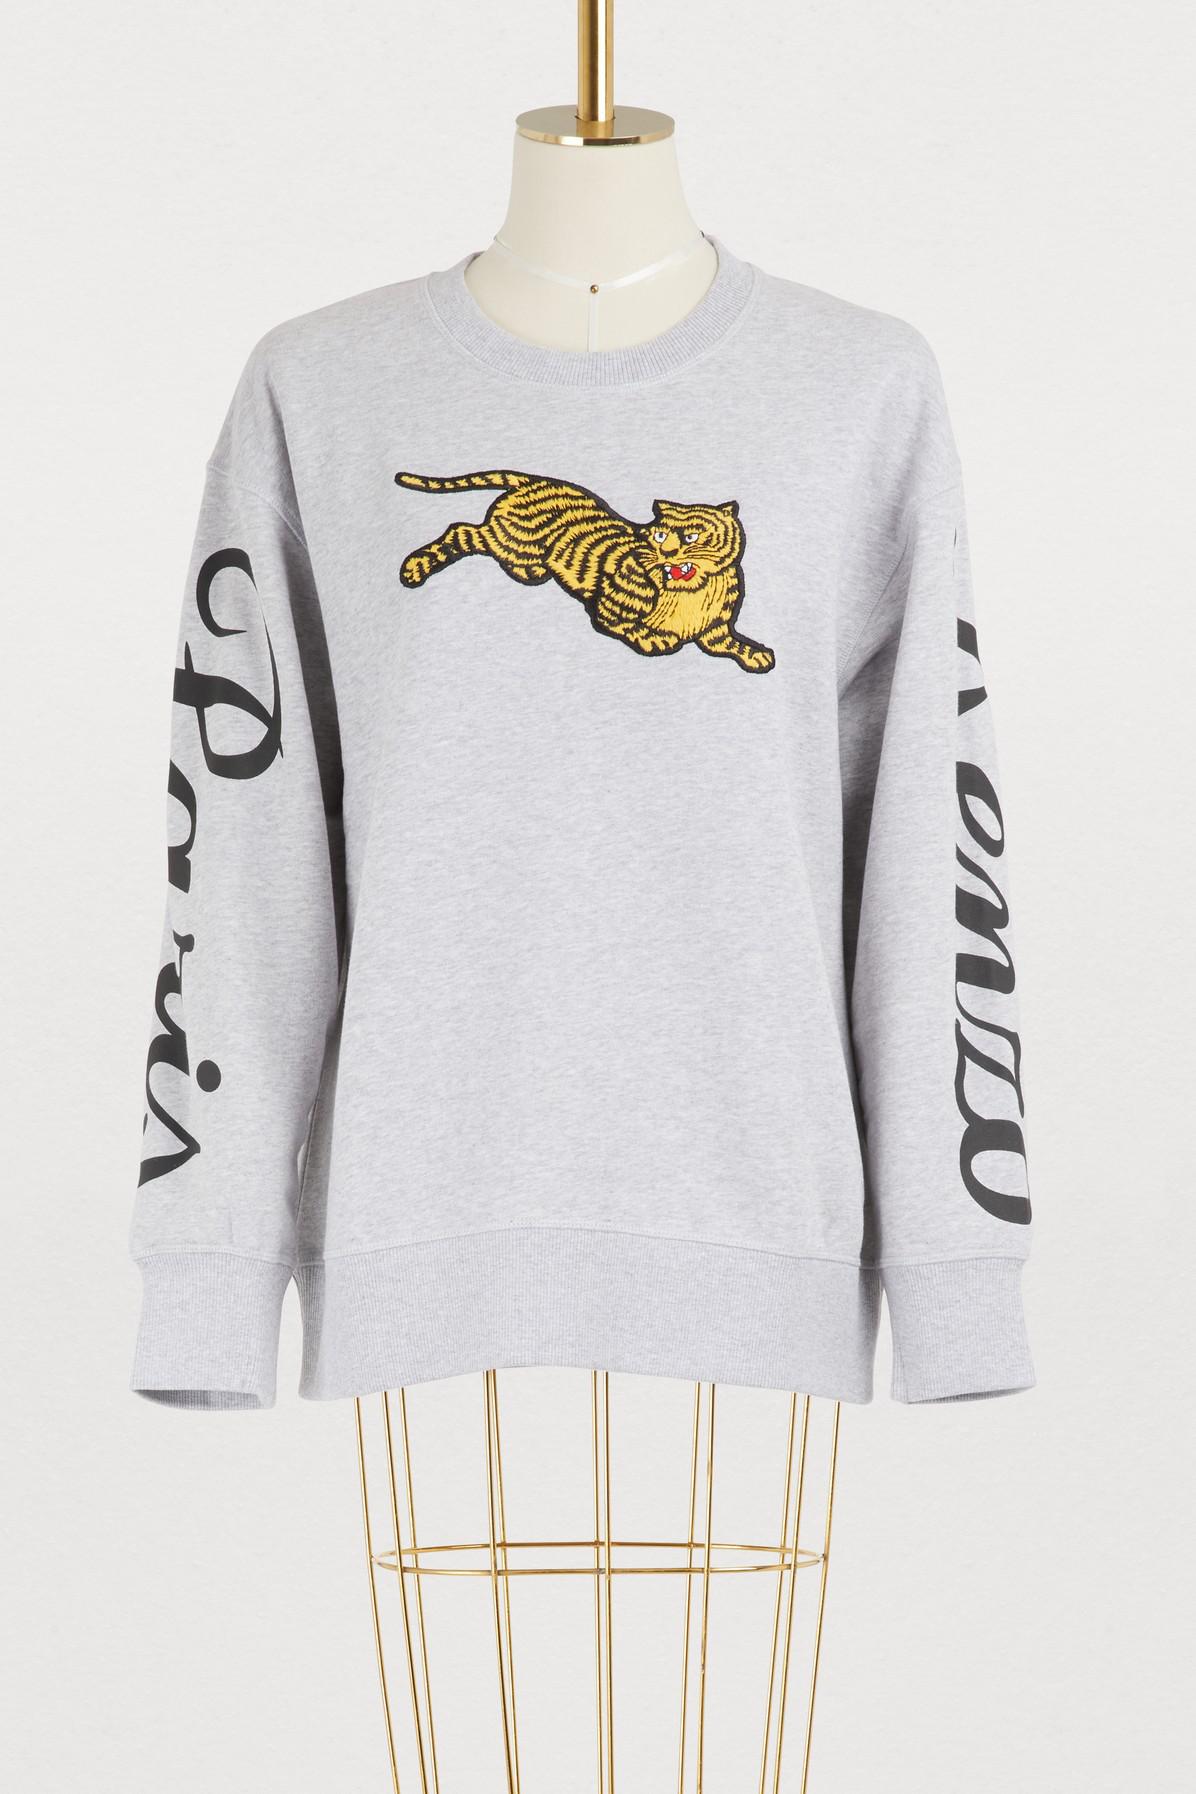 020c3896 Kenzo Cotton Jumping Tiger Sweatshirt In Pearl Grey | ModeSens